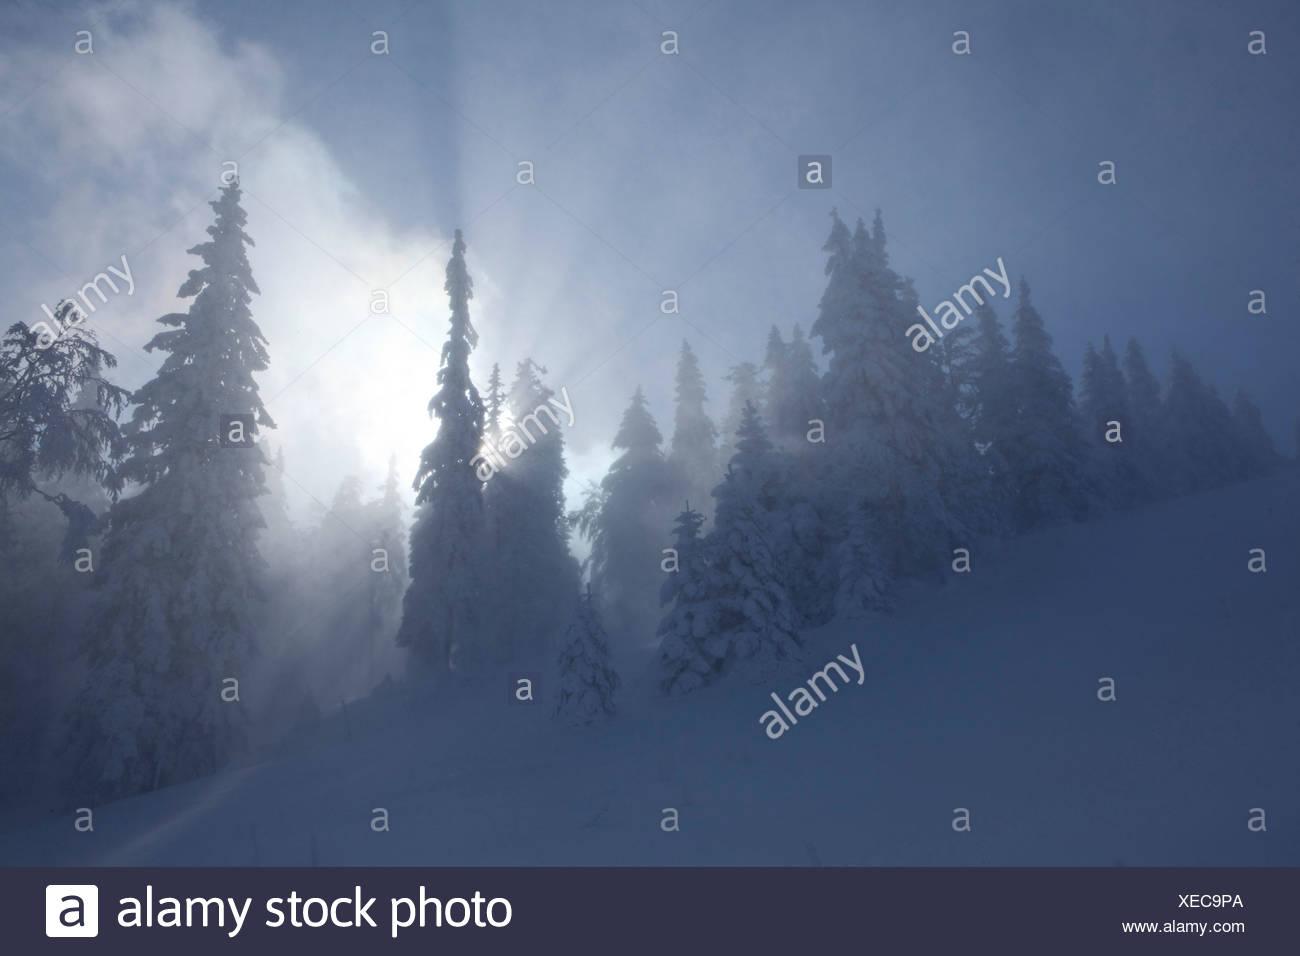 Winter trees, winter, canton, VD, Vaud, snow, tree, trees, wood, forest, snow, firs, Switzerland, Europe, sun, Col du Mollendruz - Stock Image